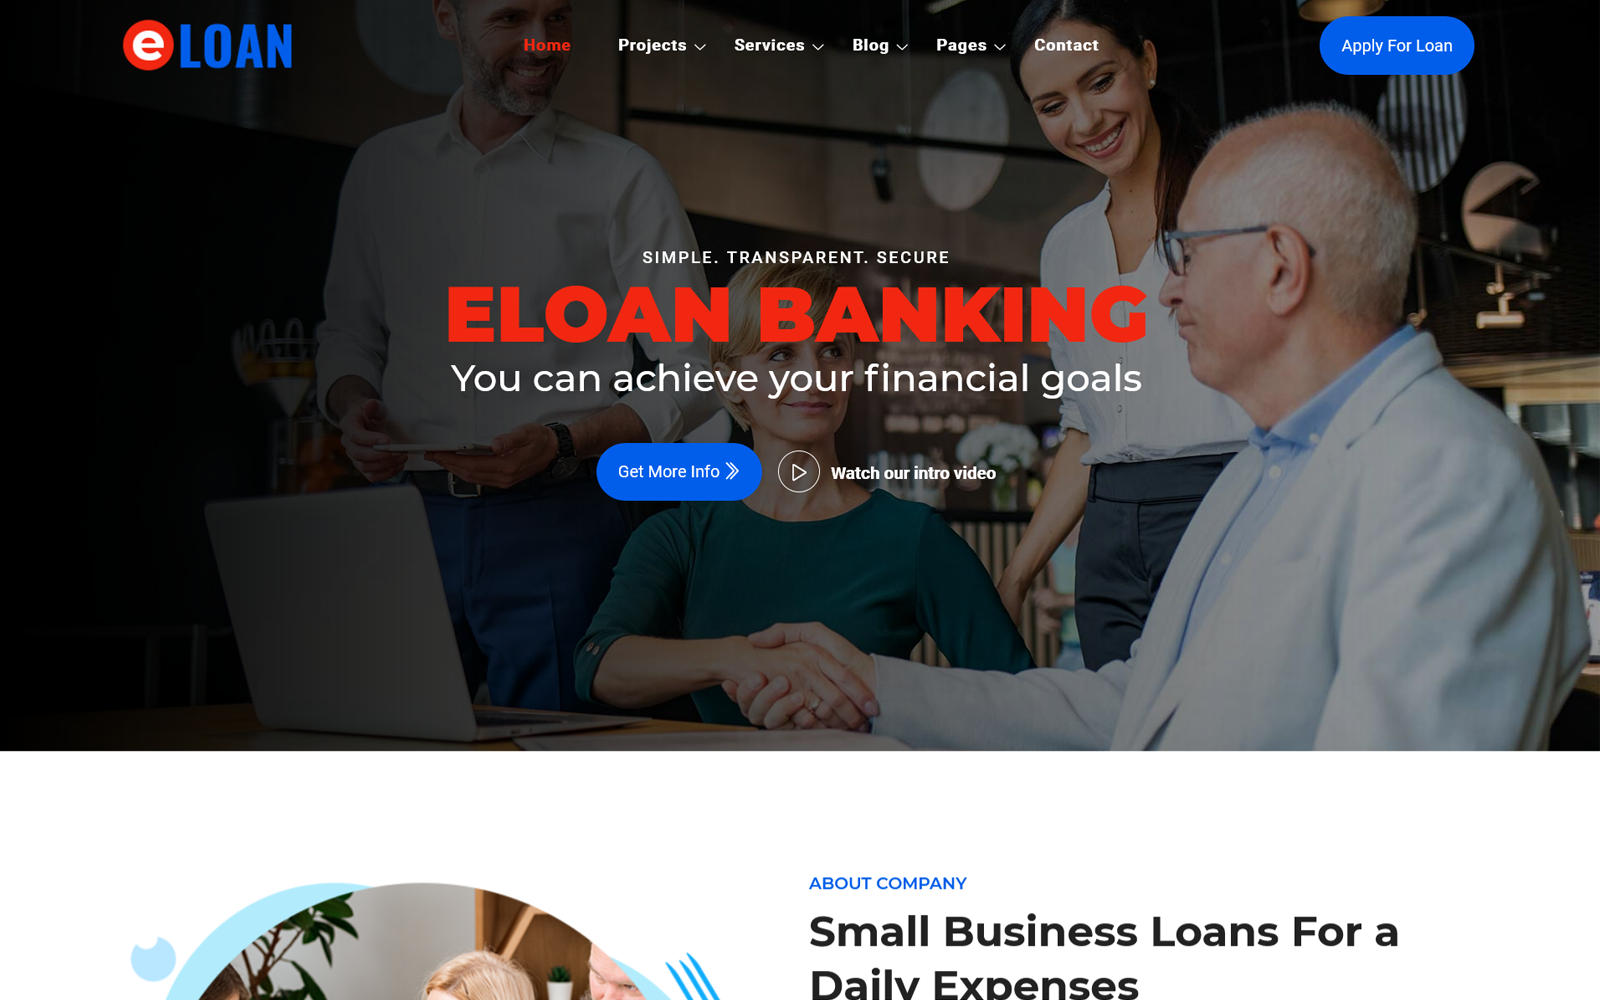 eLoan - Banking, Loan and Insurance Website Template